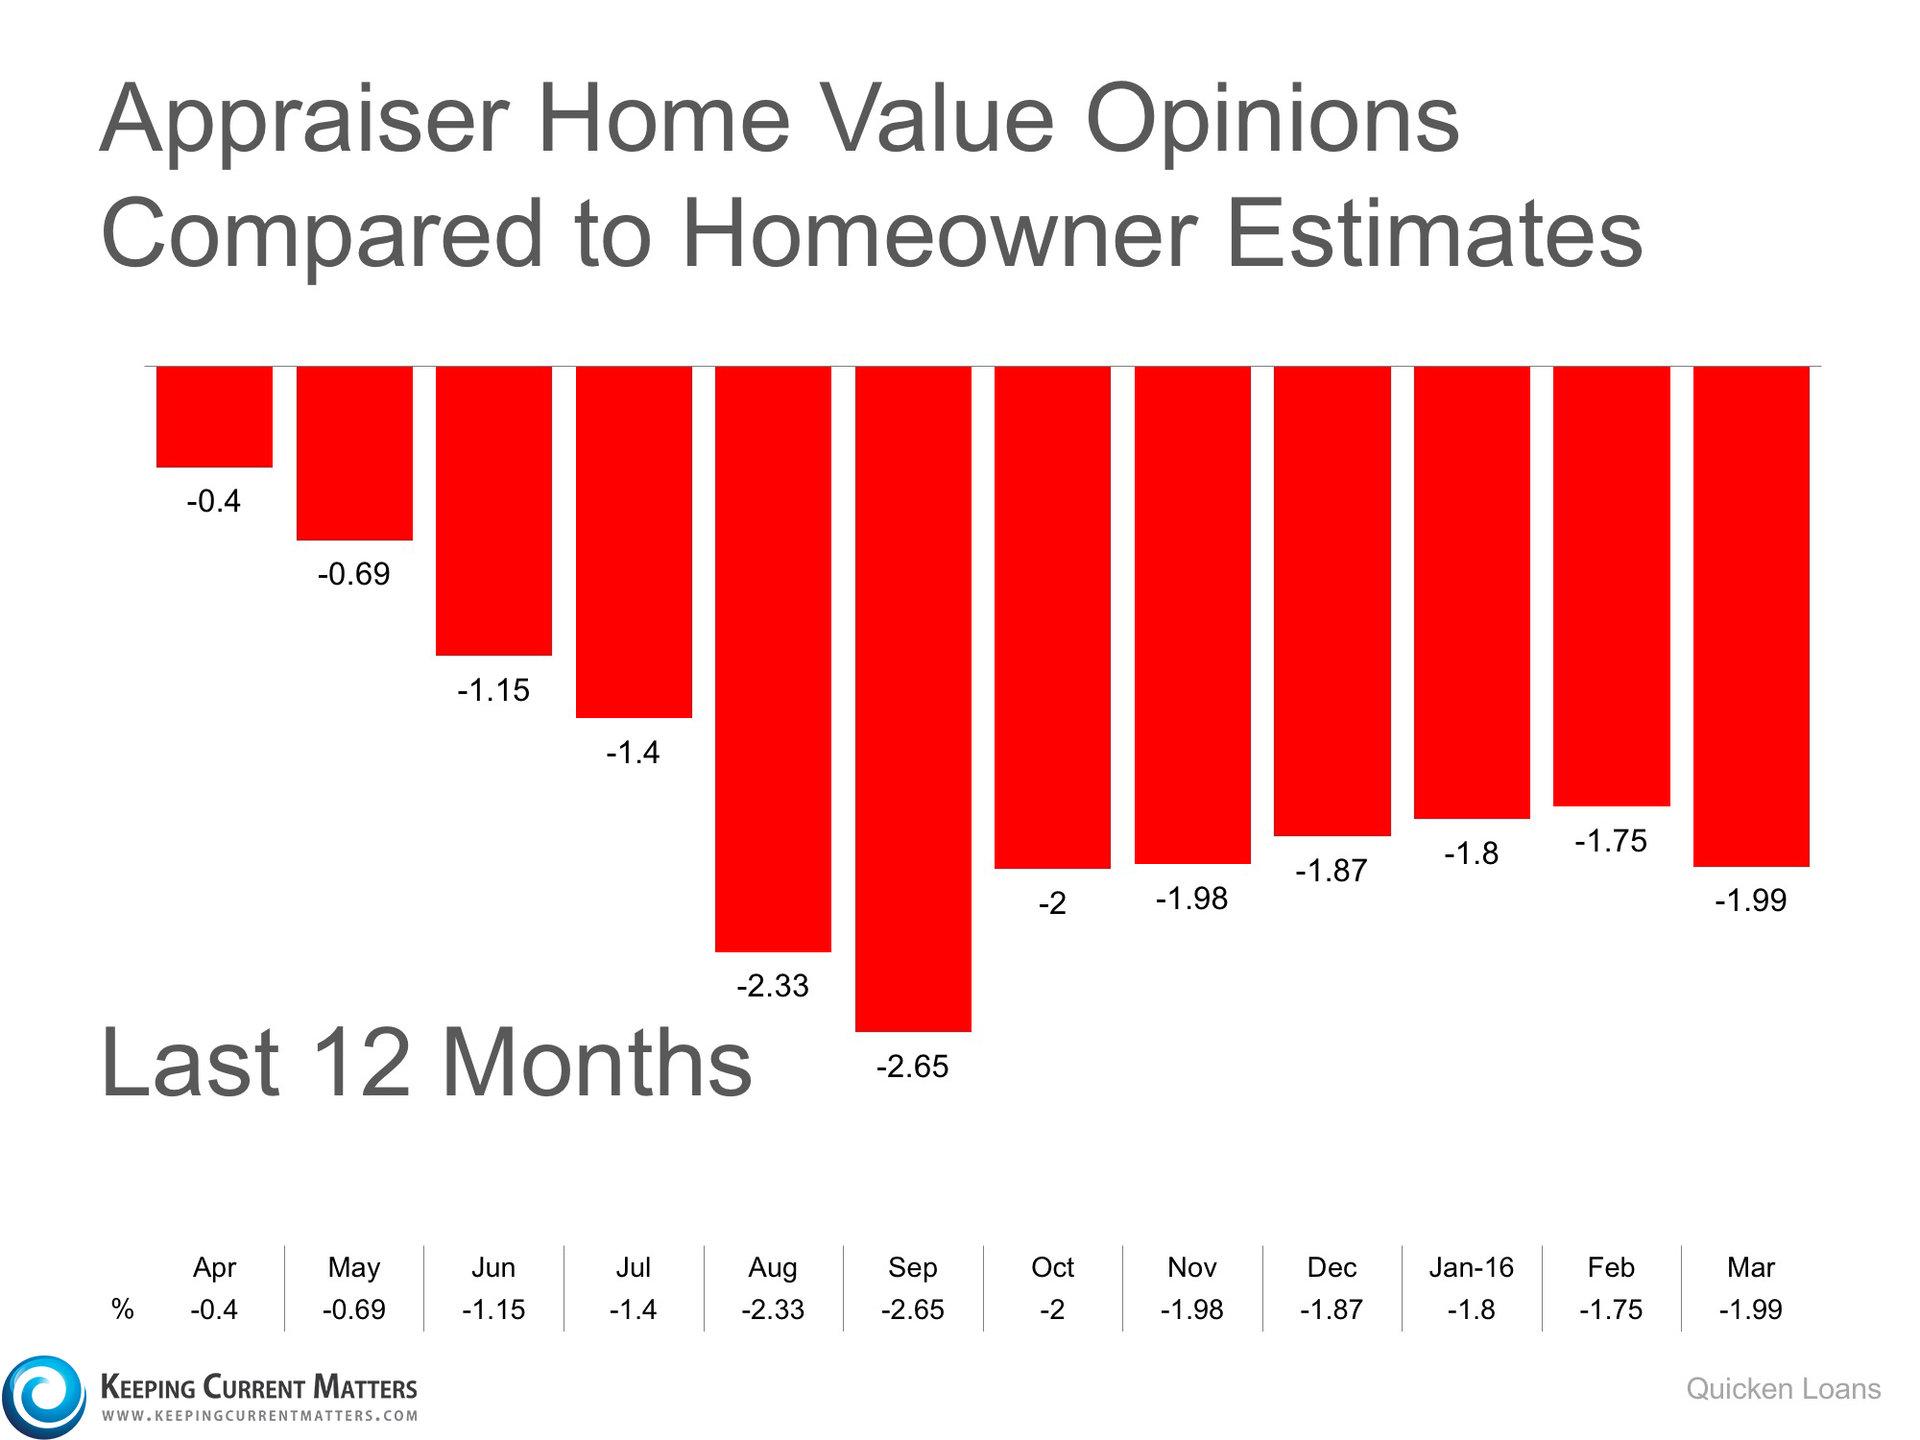 Gap Between Homeowner's & Appraiser's Opinions Widen   Keeping Current Matters